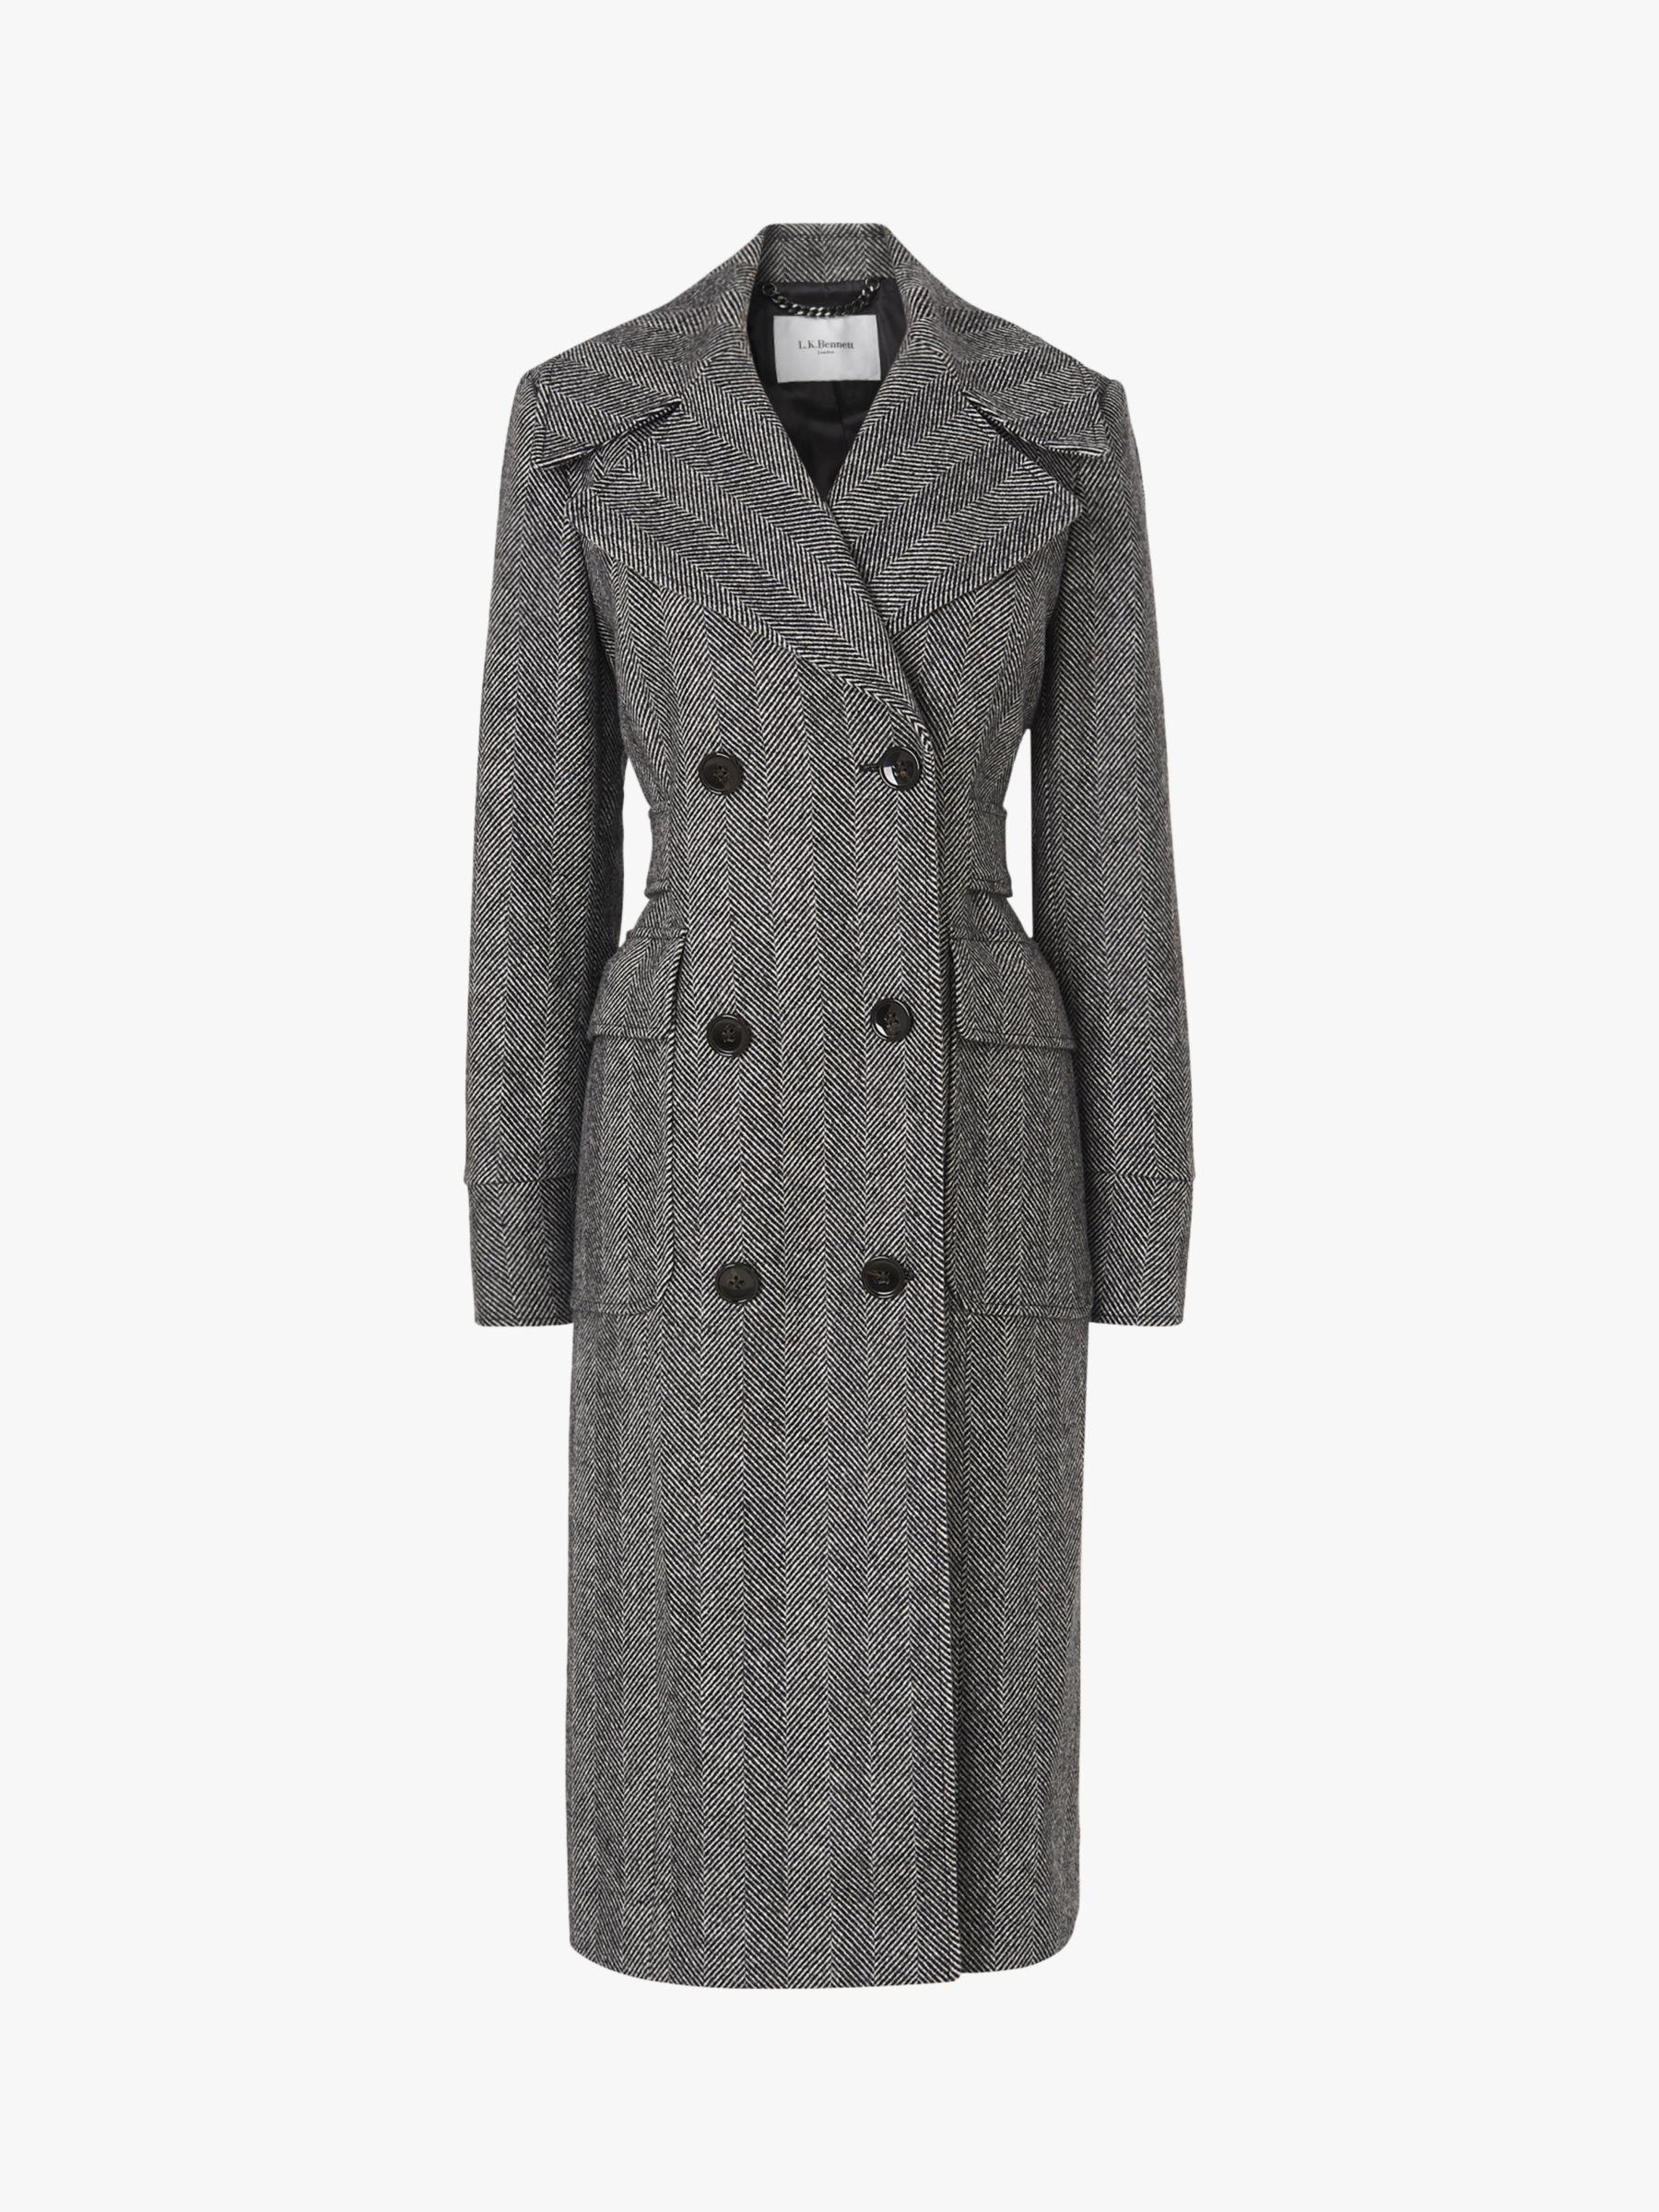 L.K.Bennett L.K.Bennett Aurelia Herringbone Trench Coat, Grey